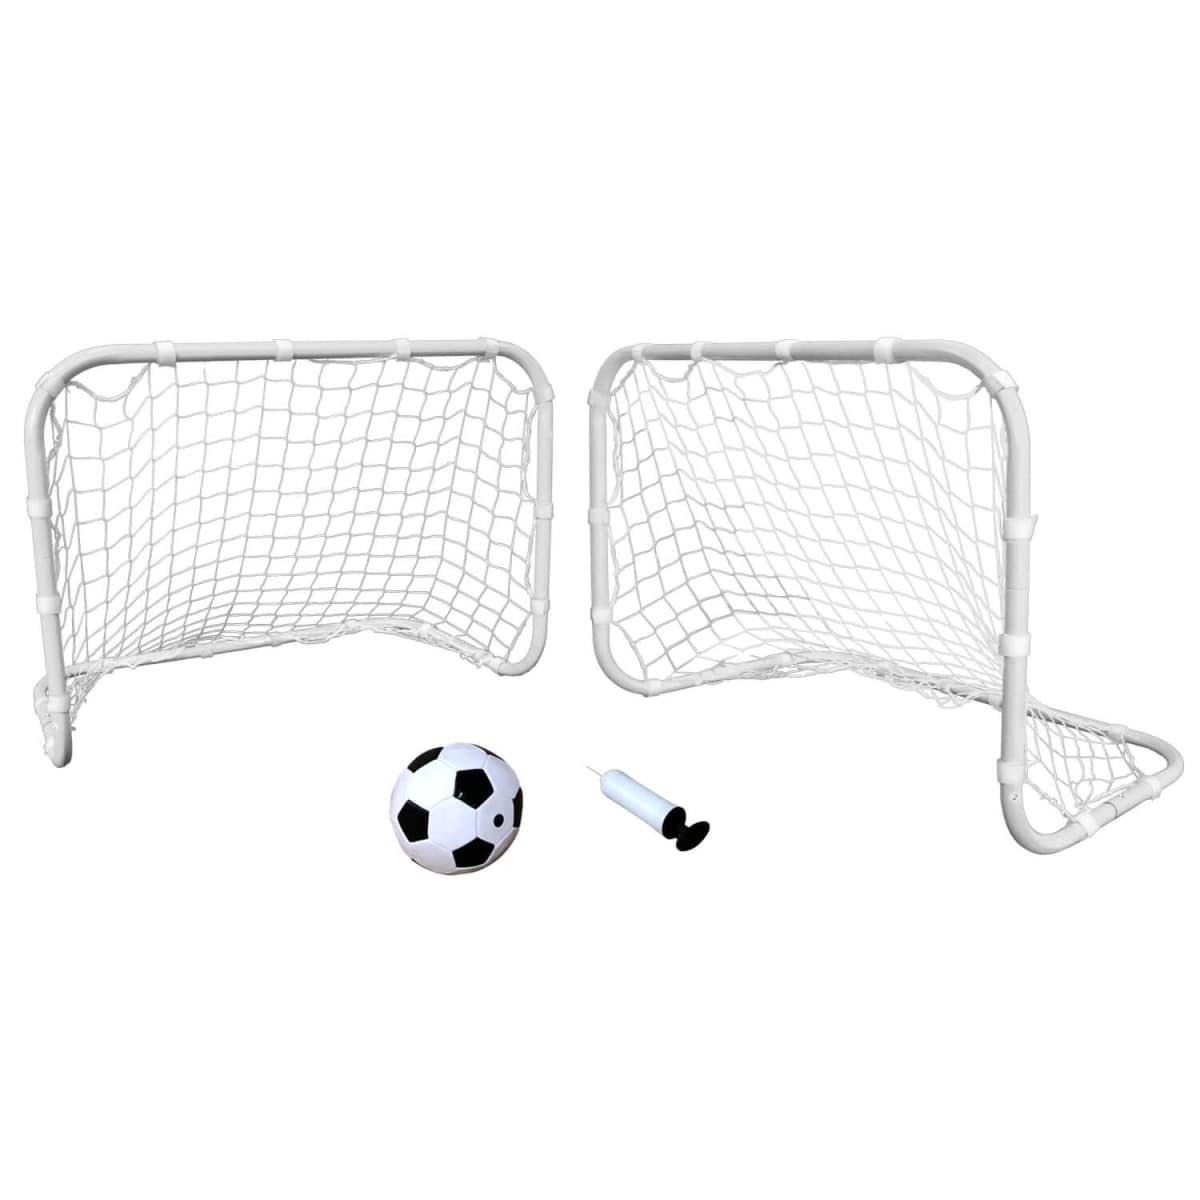 01c0e64e4 Soccer | Goal Posts | Sportsmans Warehouse